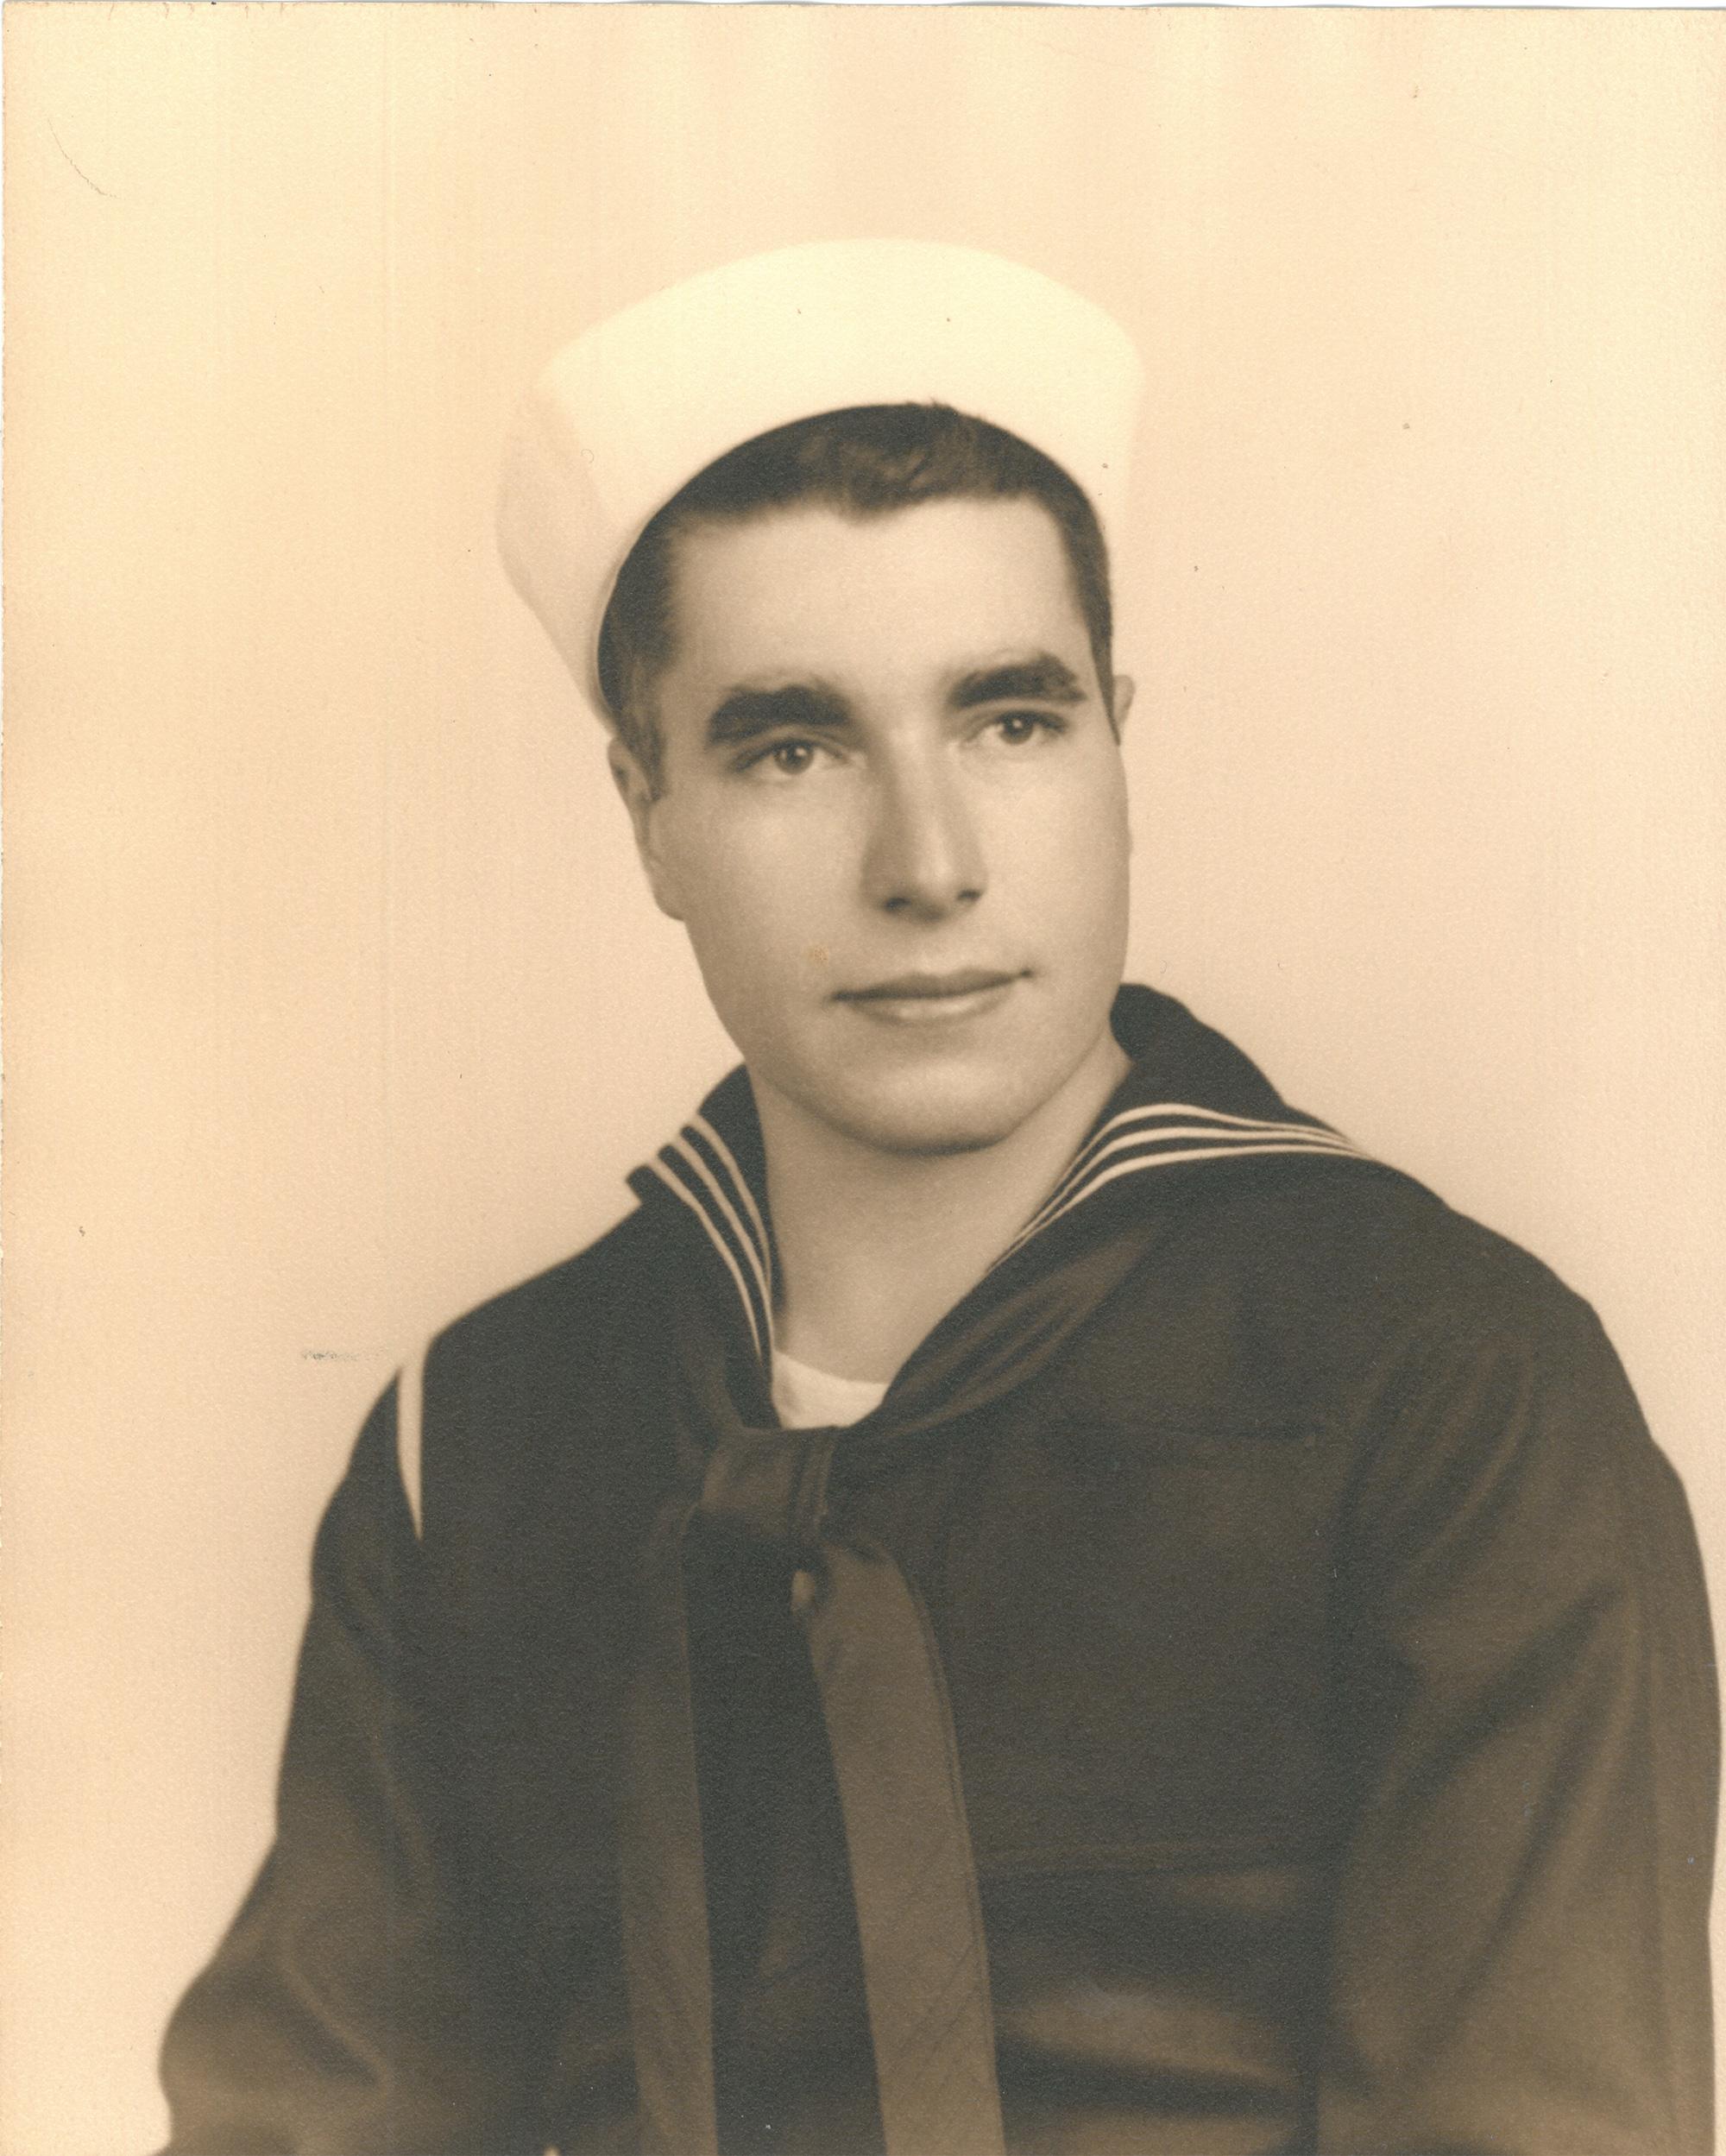 Andy's Navy Photo